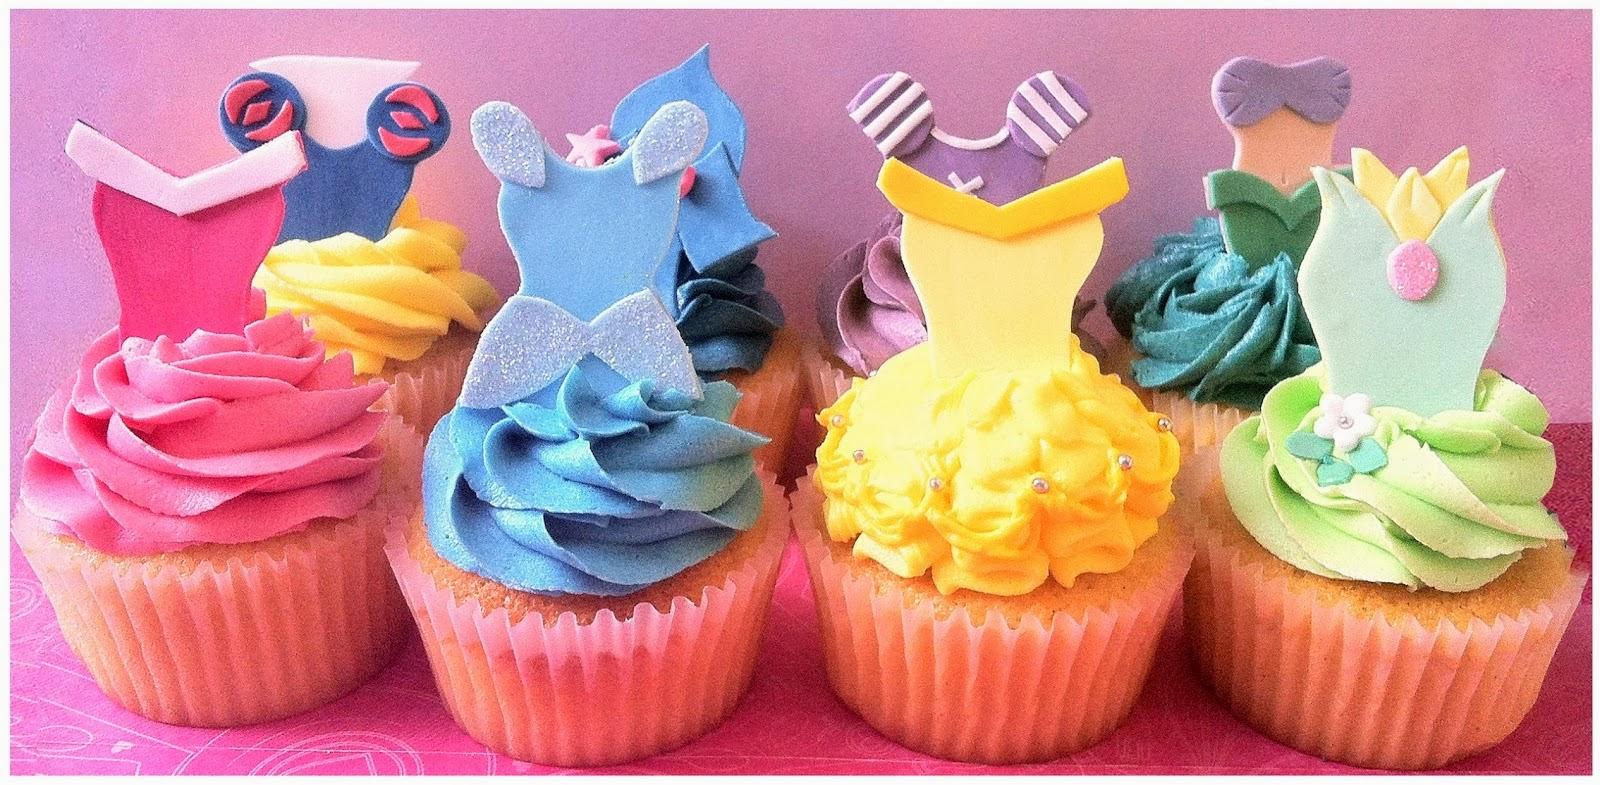 comel cupcake